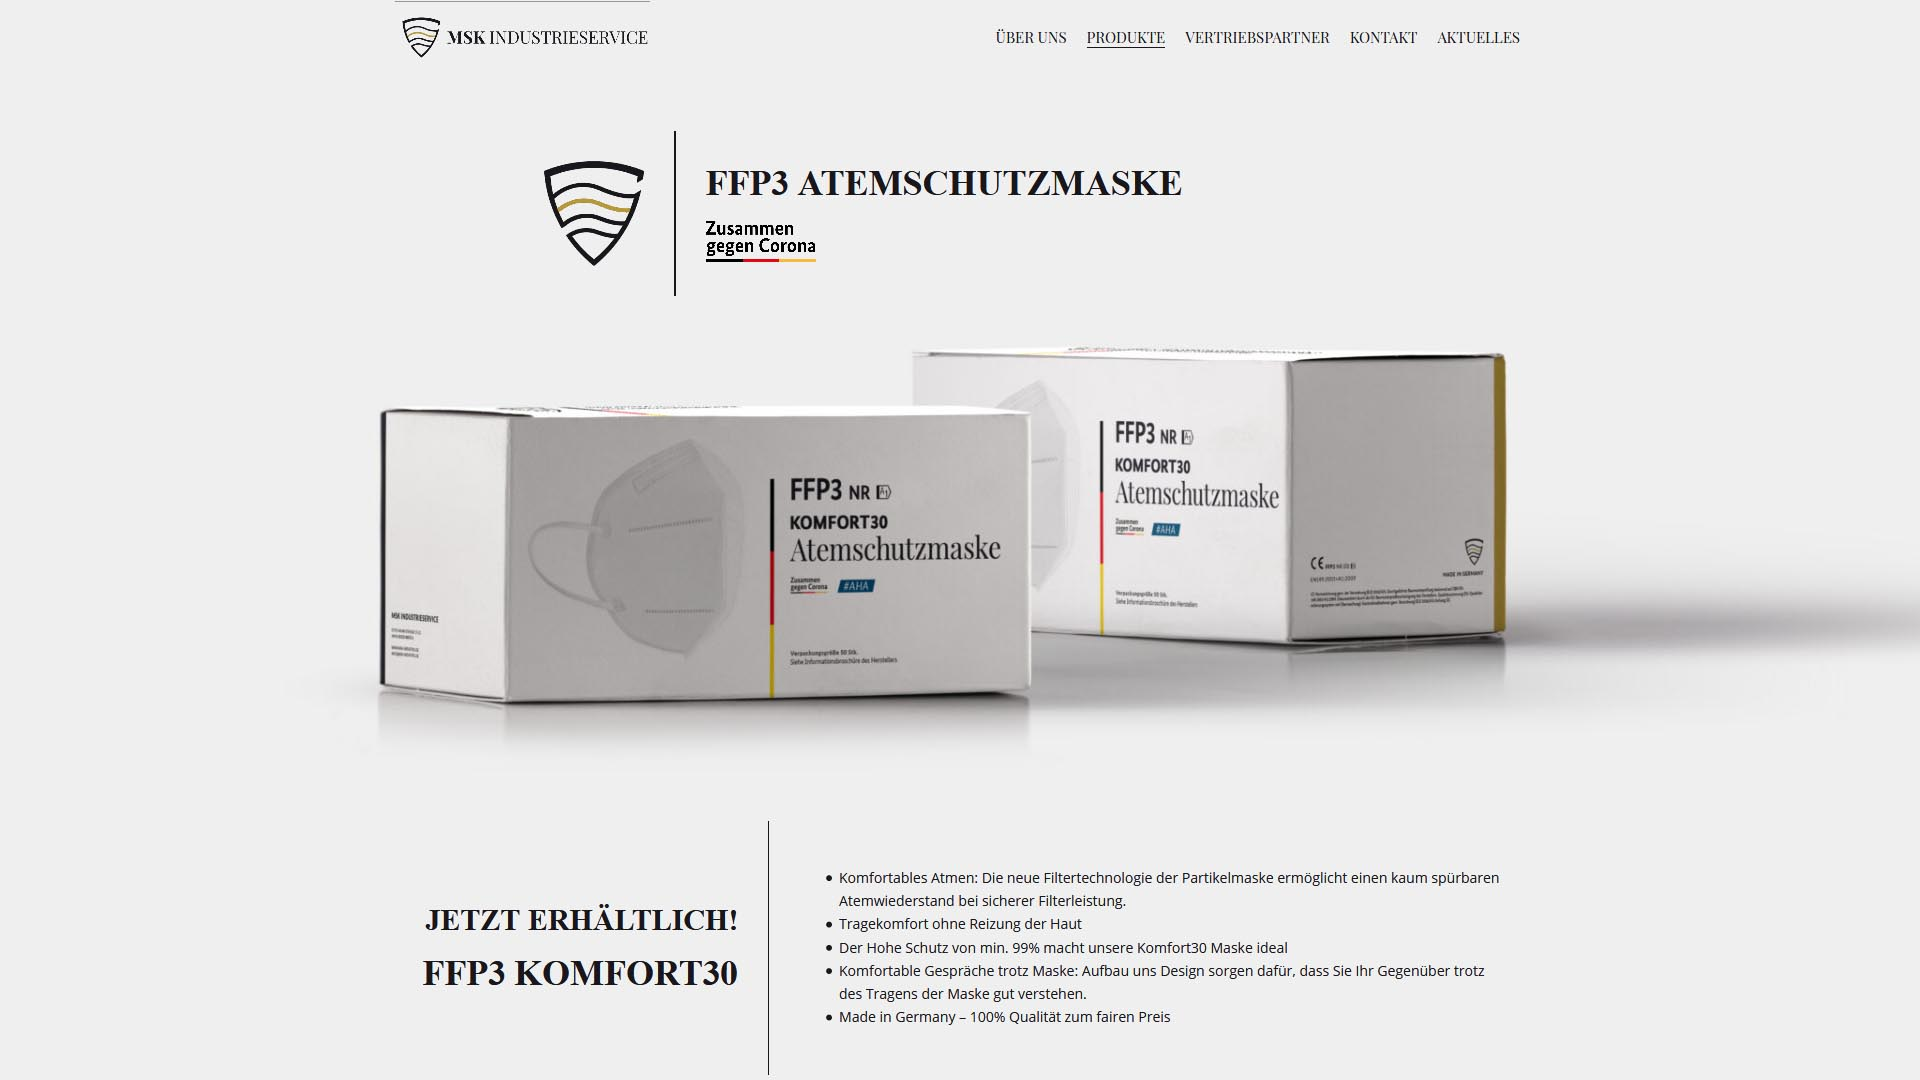 msk industrieservice atemschutzmasken ffp2 relaunch 7